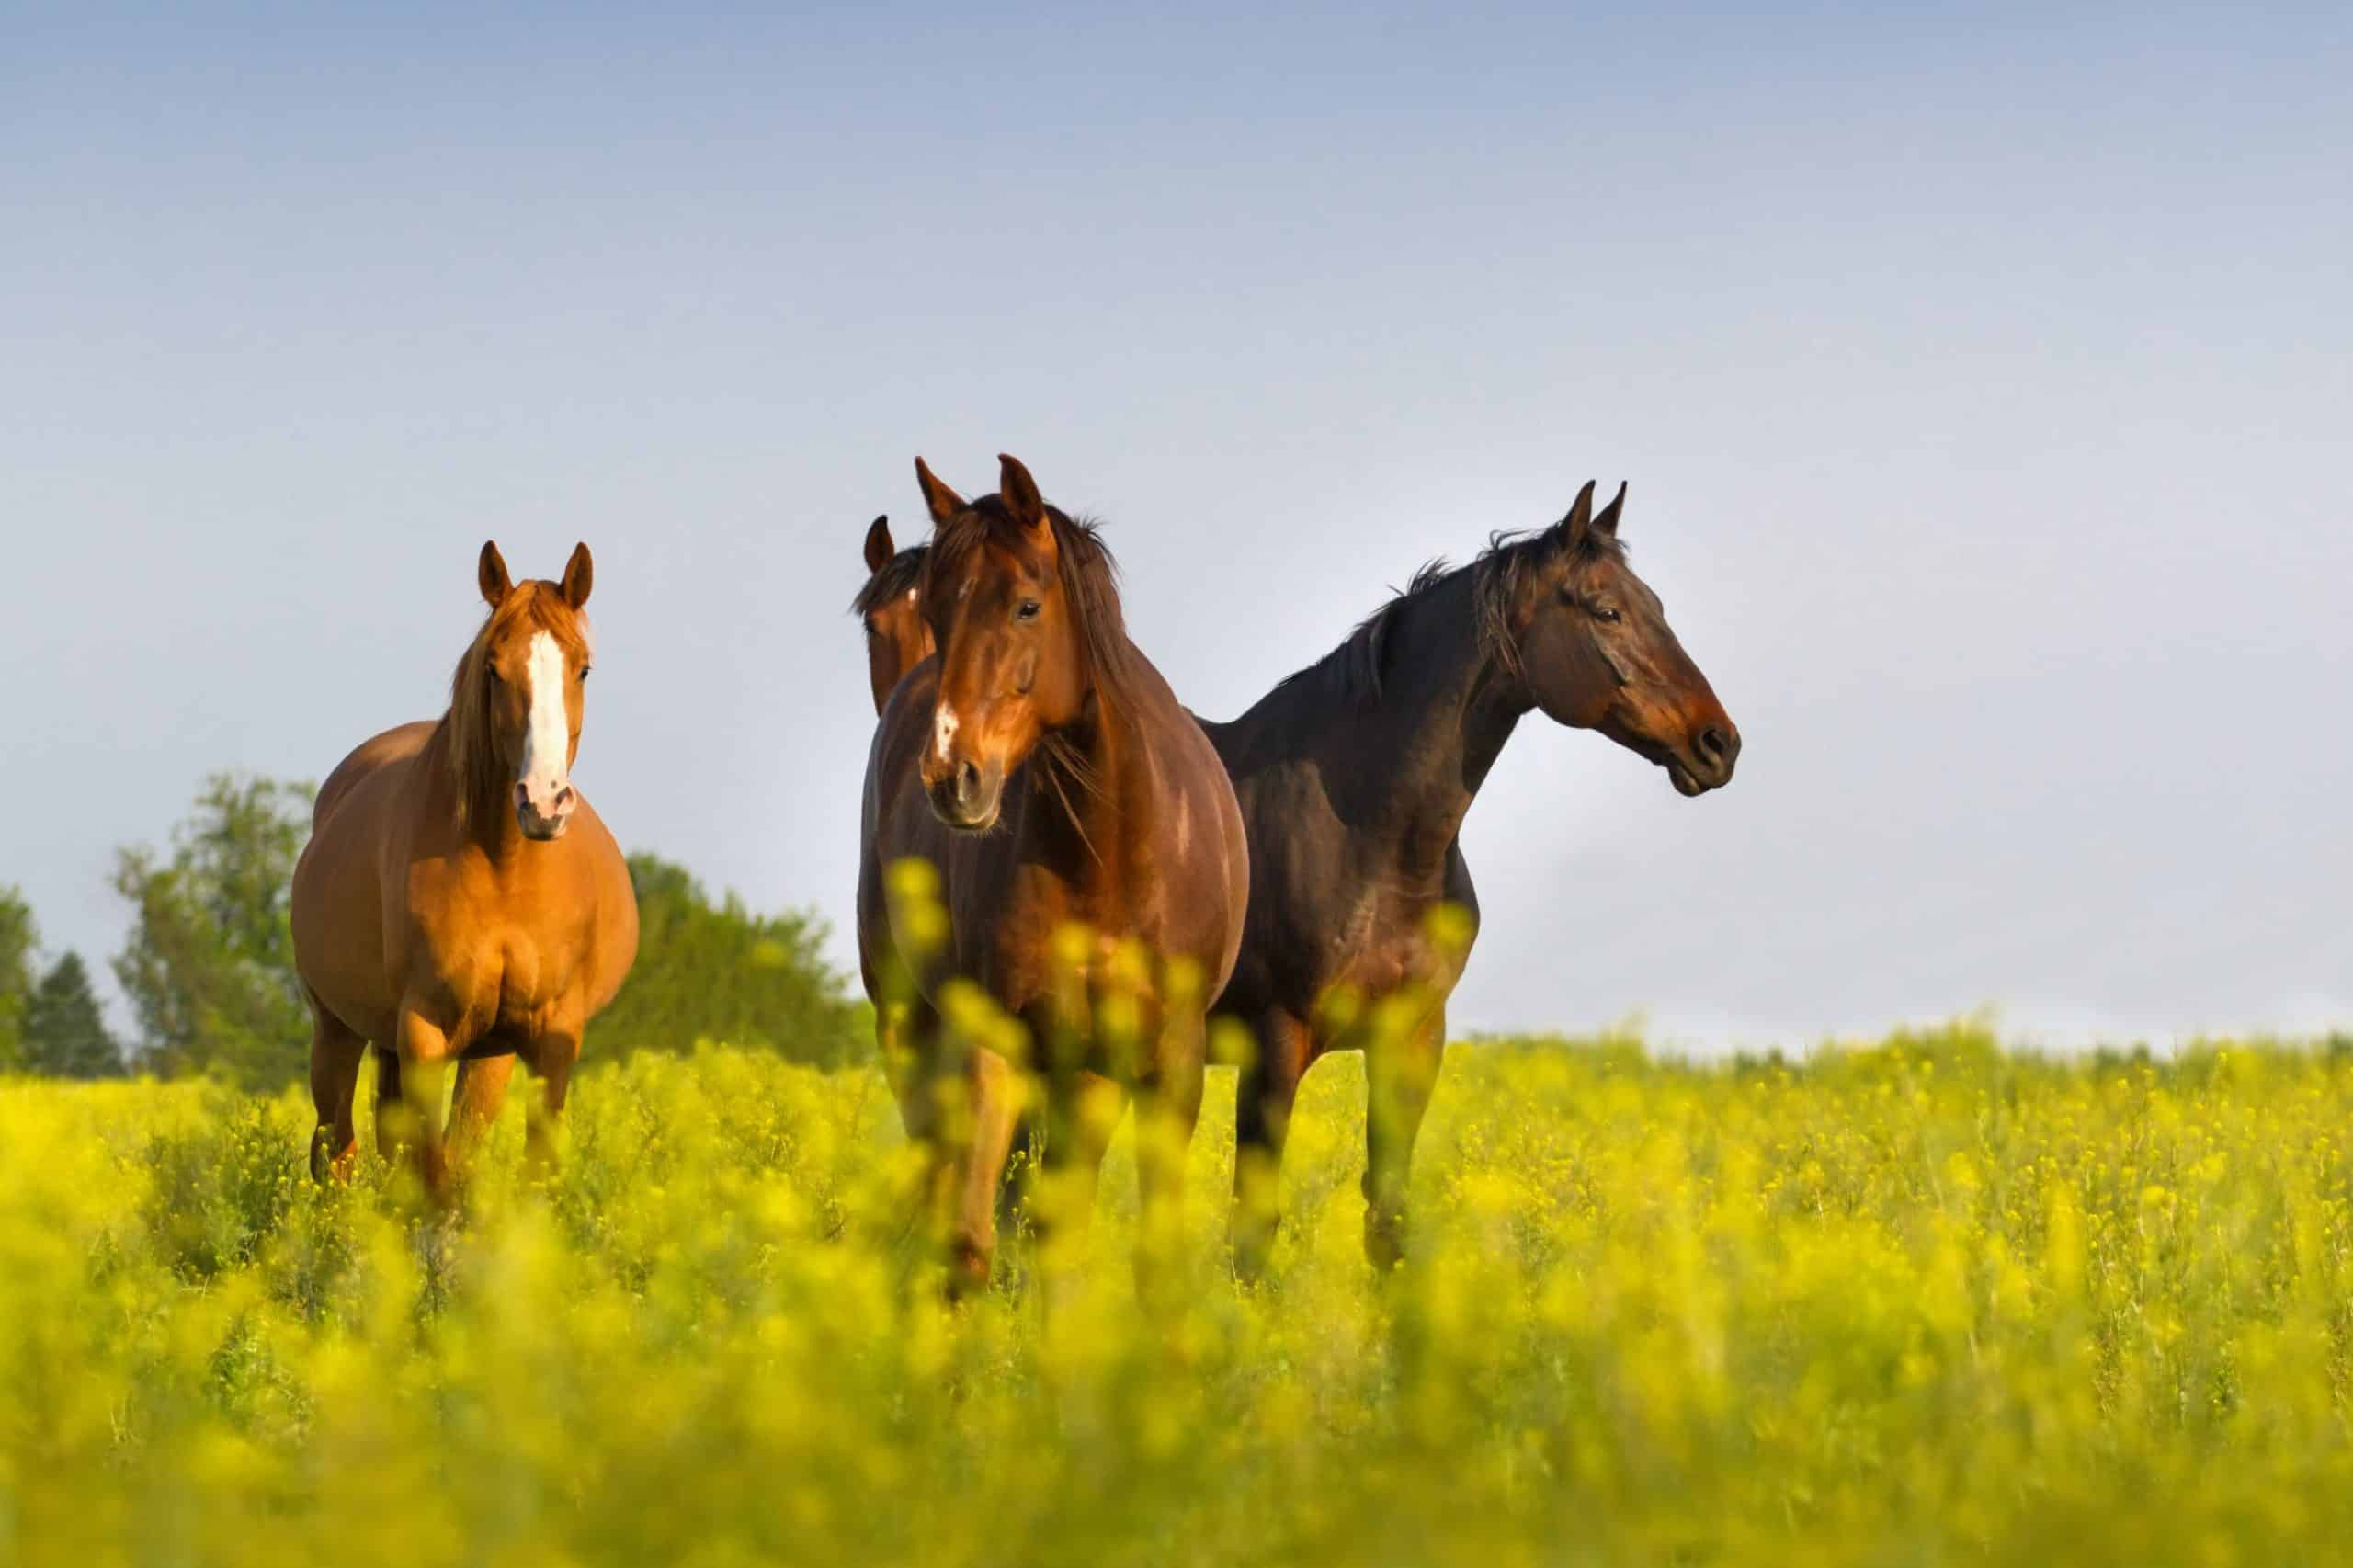 Horse herd on pasture against blue sky